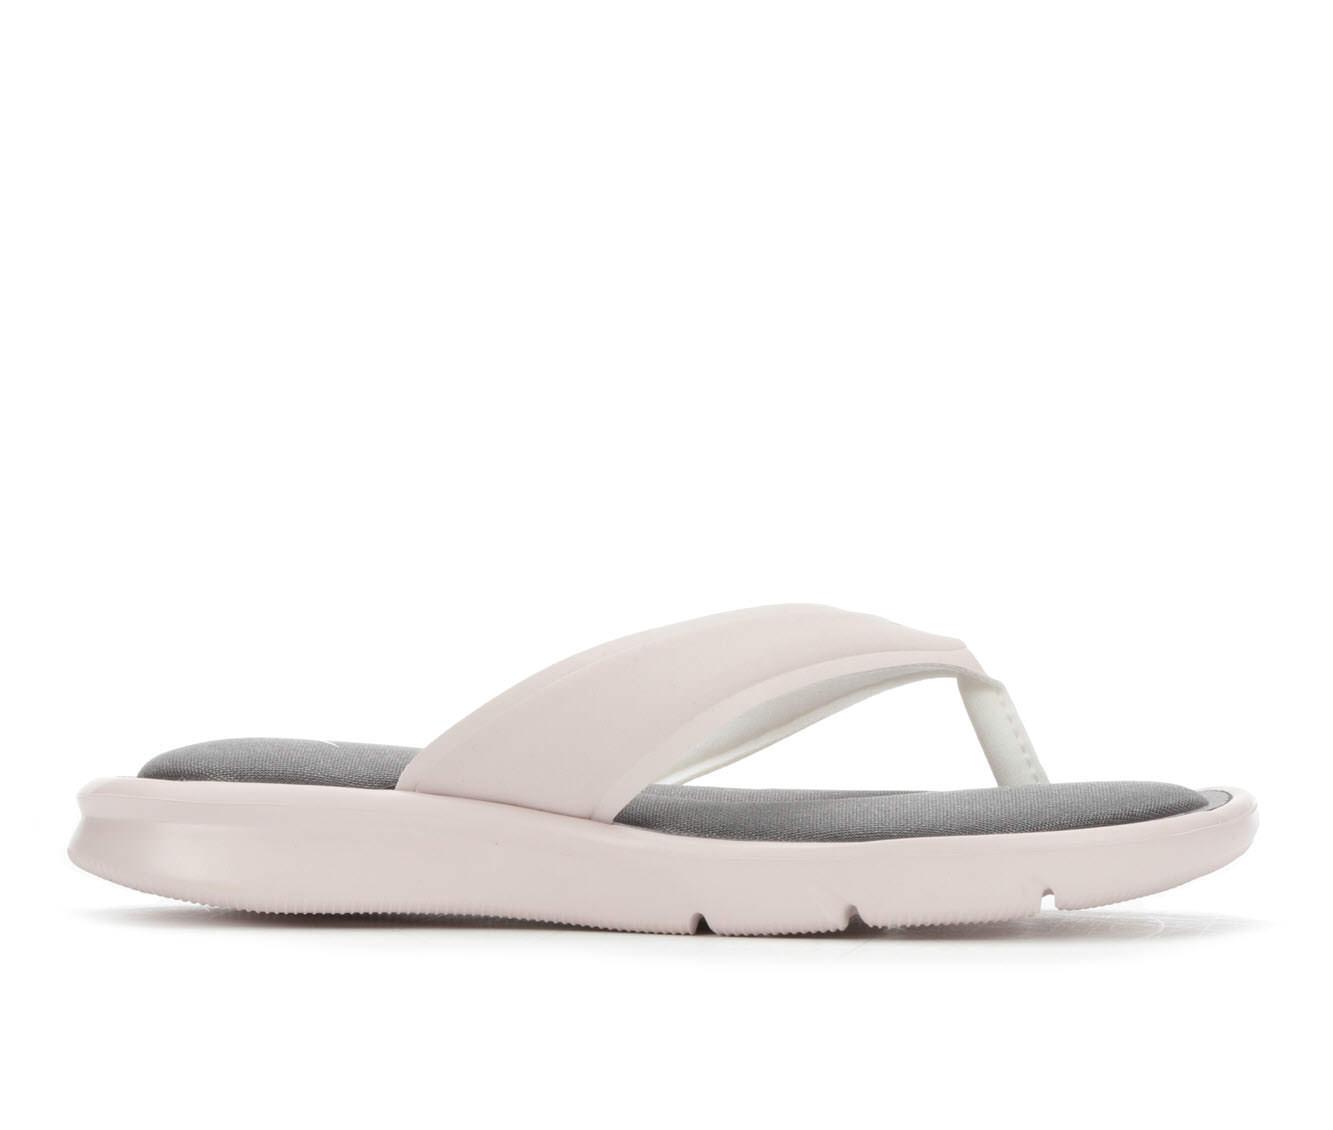 Women's Nike Ultra Comfort Flip-Flop Sandals (Pink - Size 7) 1711053